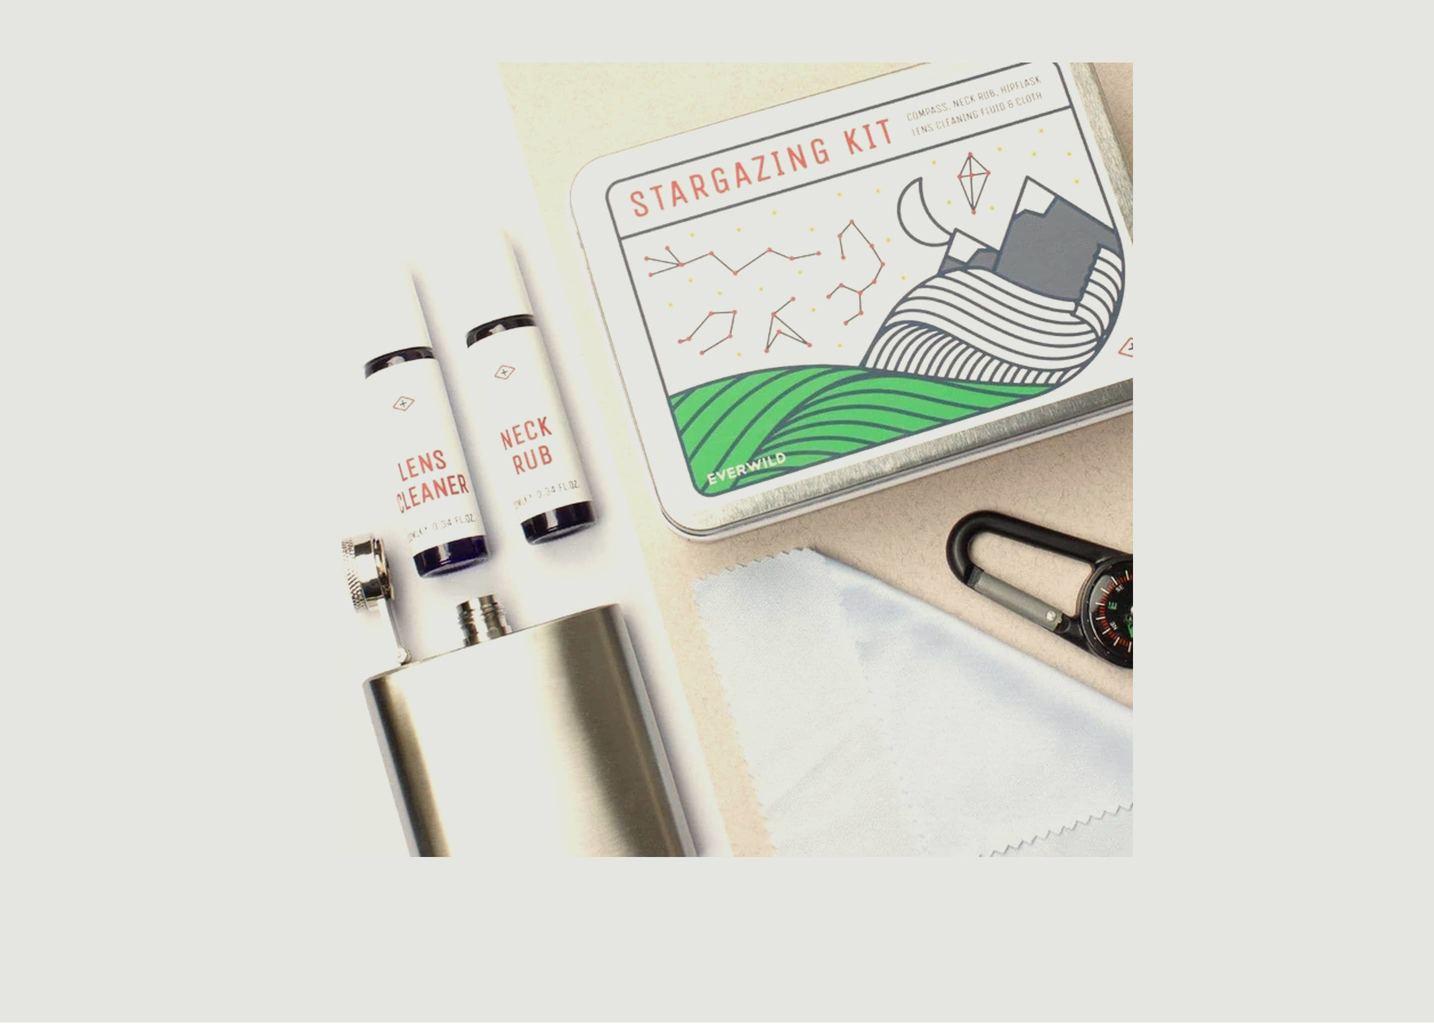 Kit Observation des Etoiles - Men's Society